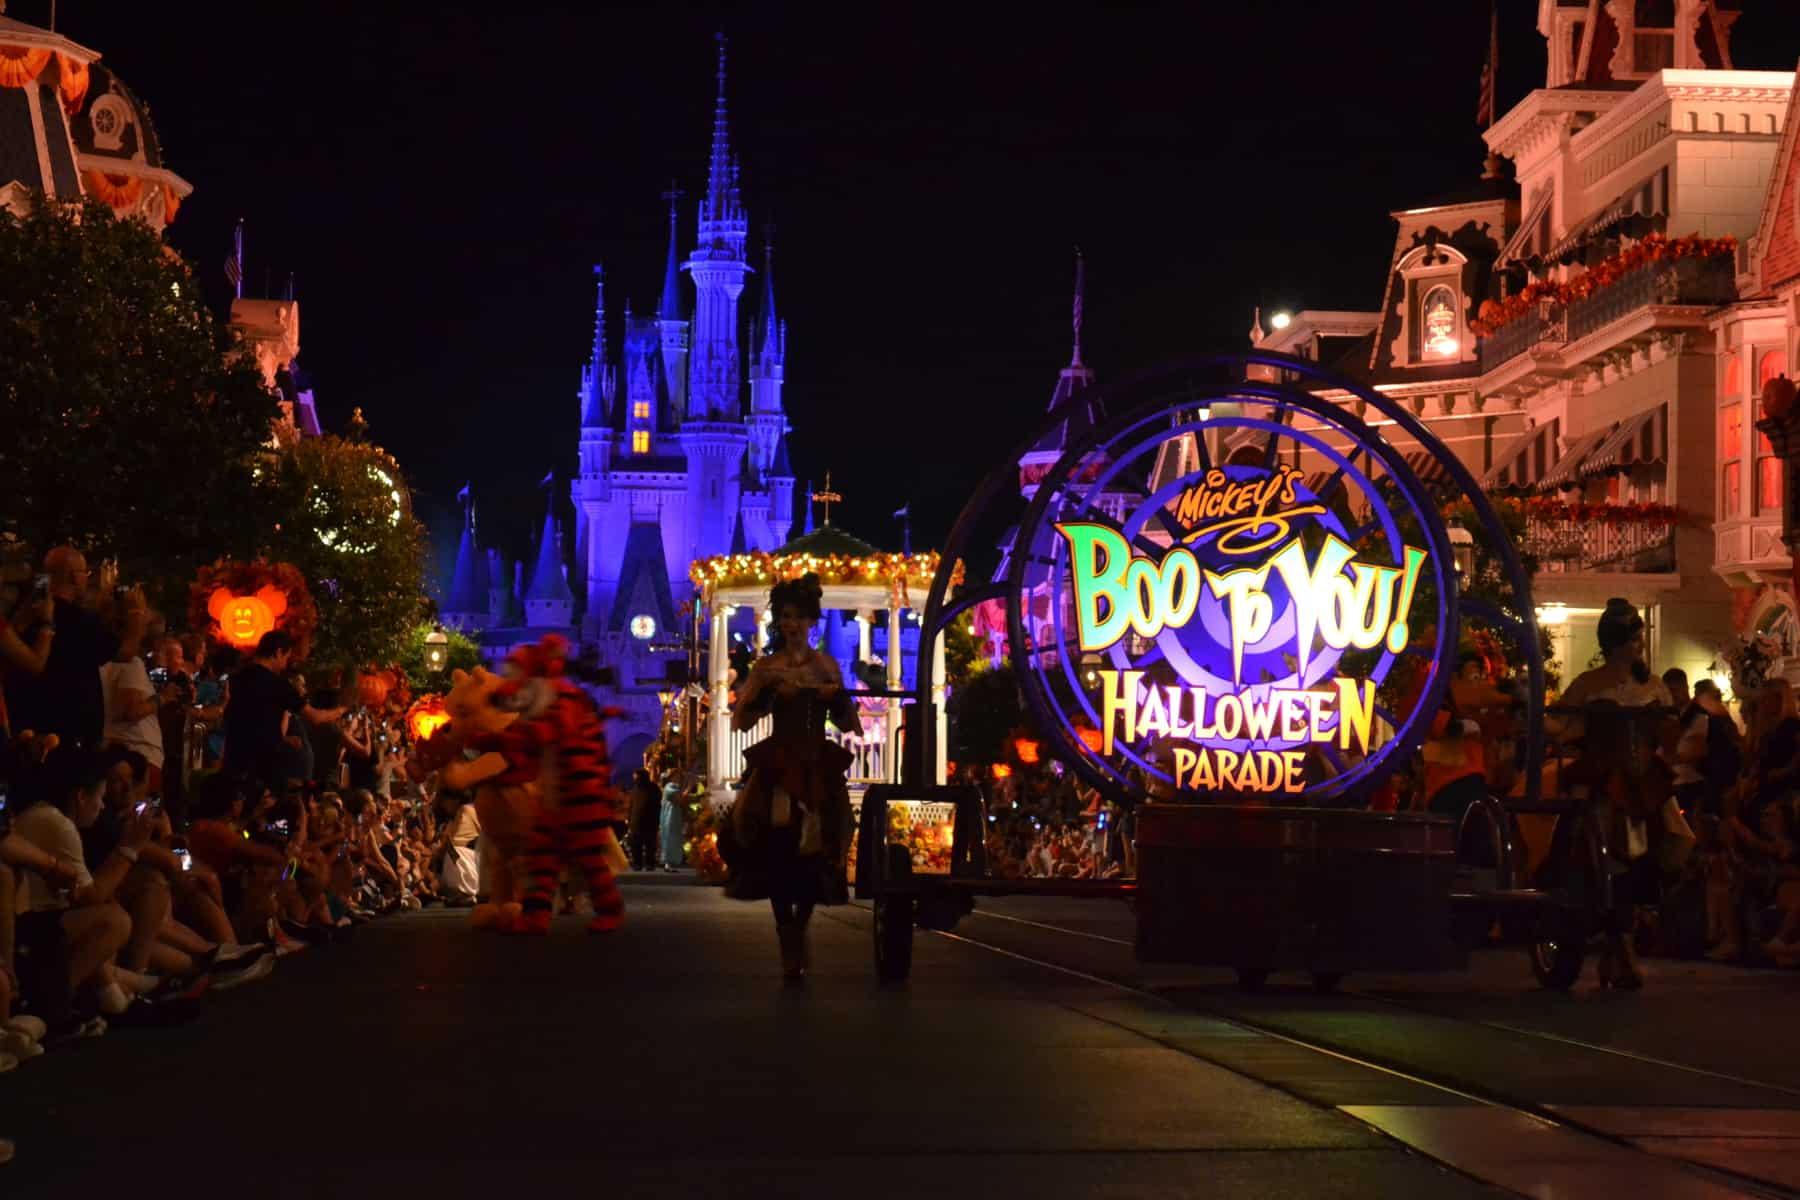 Boo-to-You Parade (seasonal)